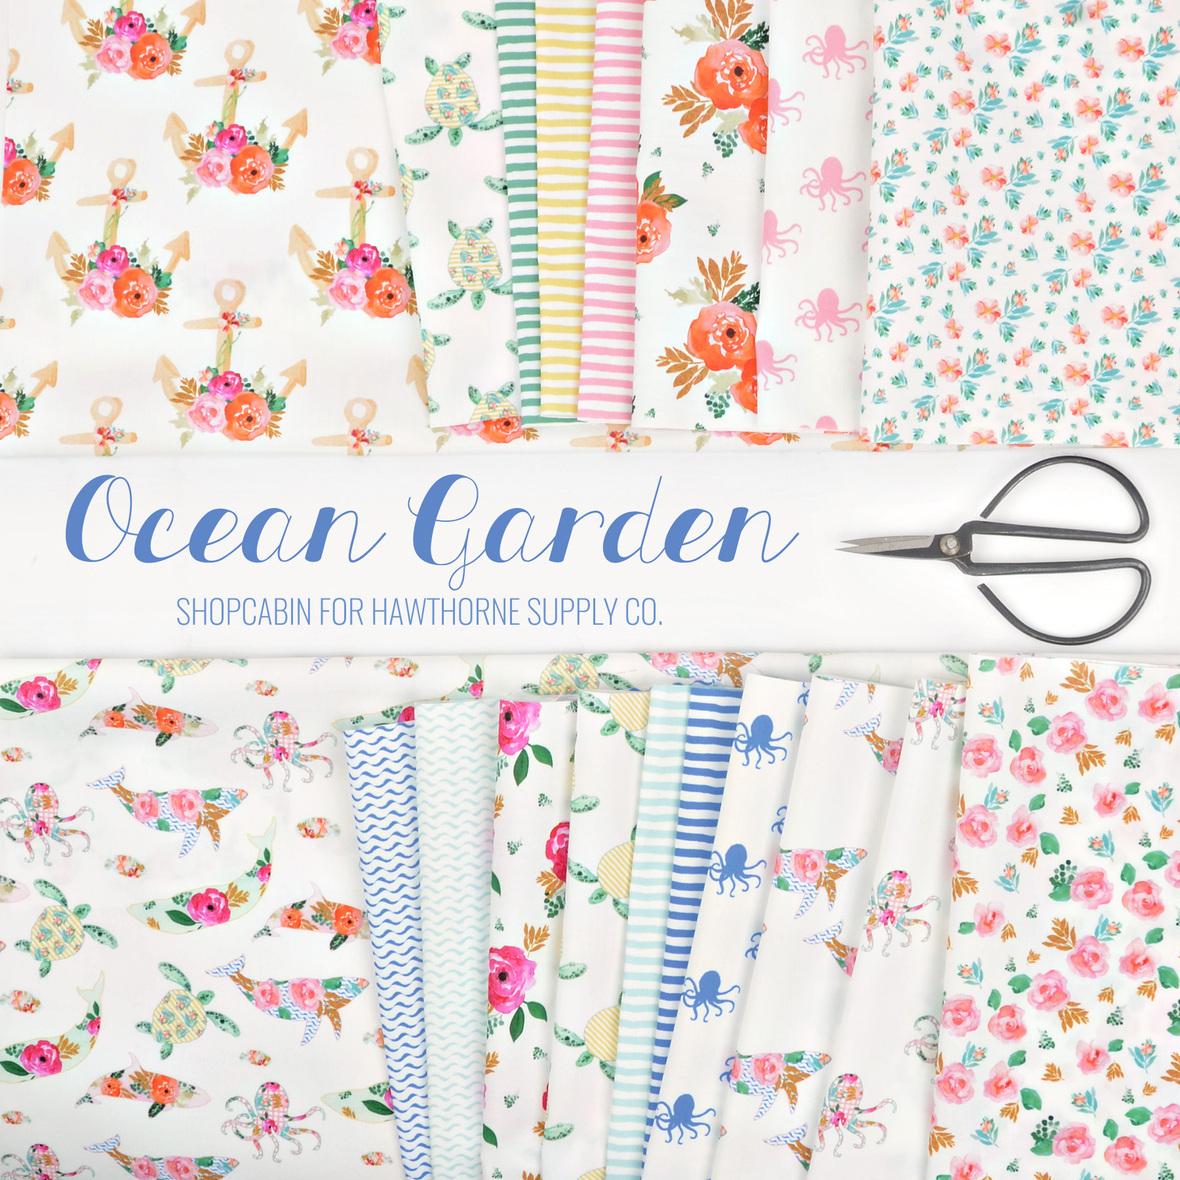 Ocean Garden Fabric Shopcabin for Hawthorne Supply Co